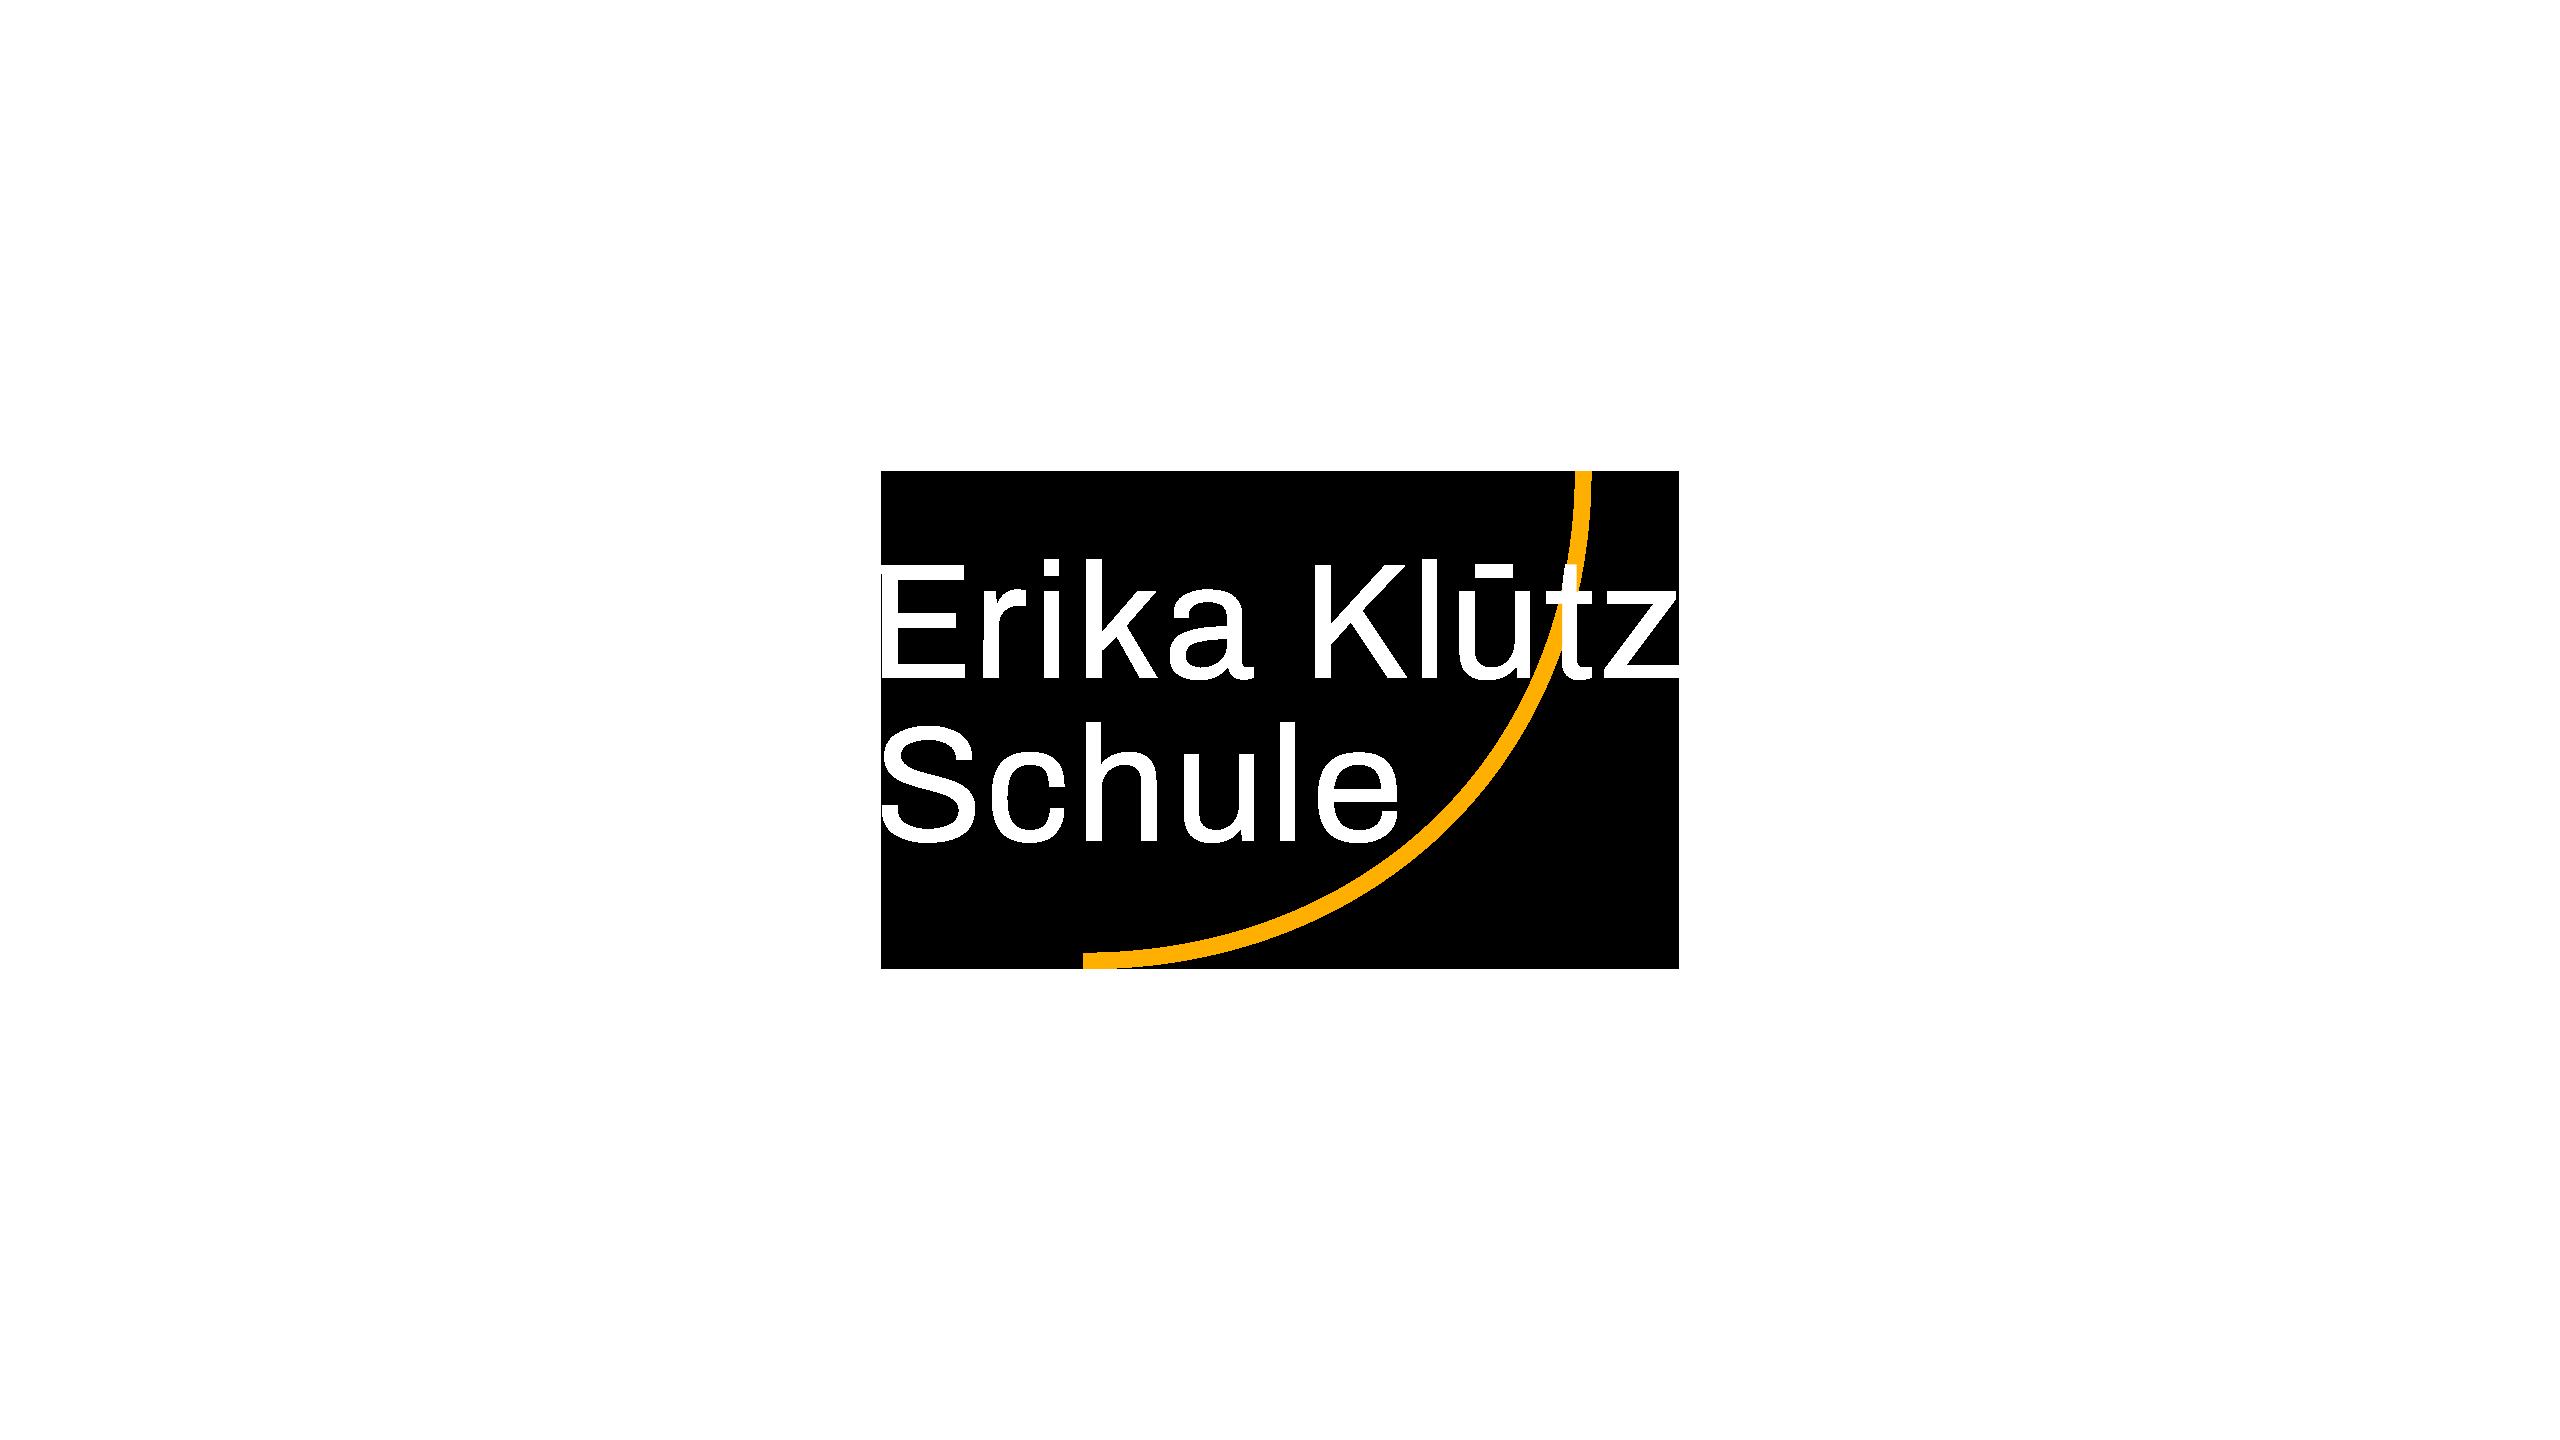 Branding for Erika Kluetz School Hamburg